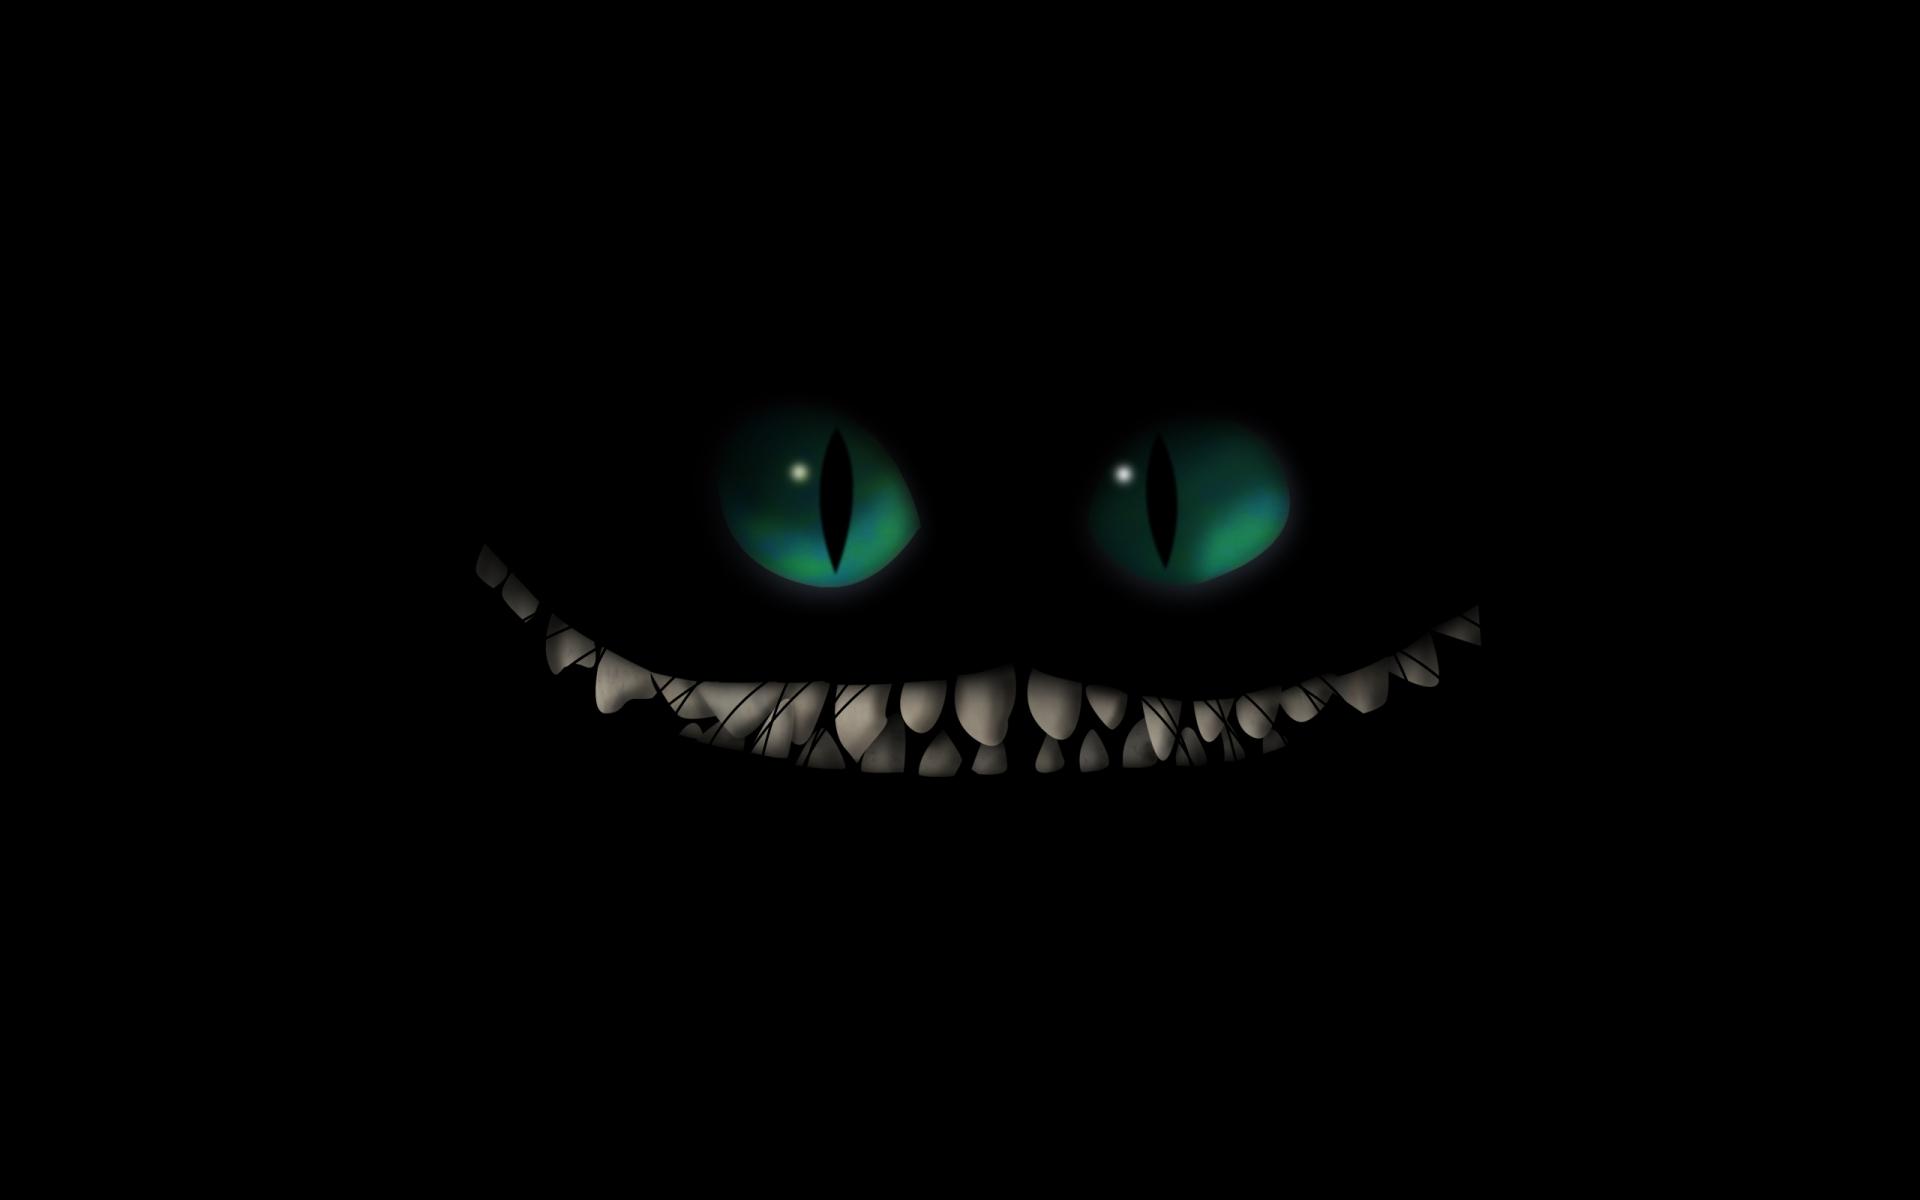 Dark monster creature fangs evil scary creepy spooky halloween ...